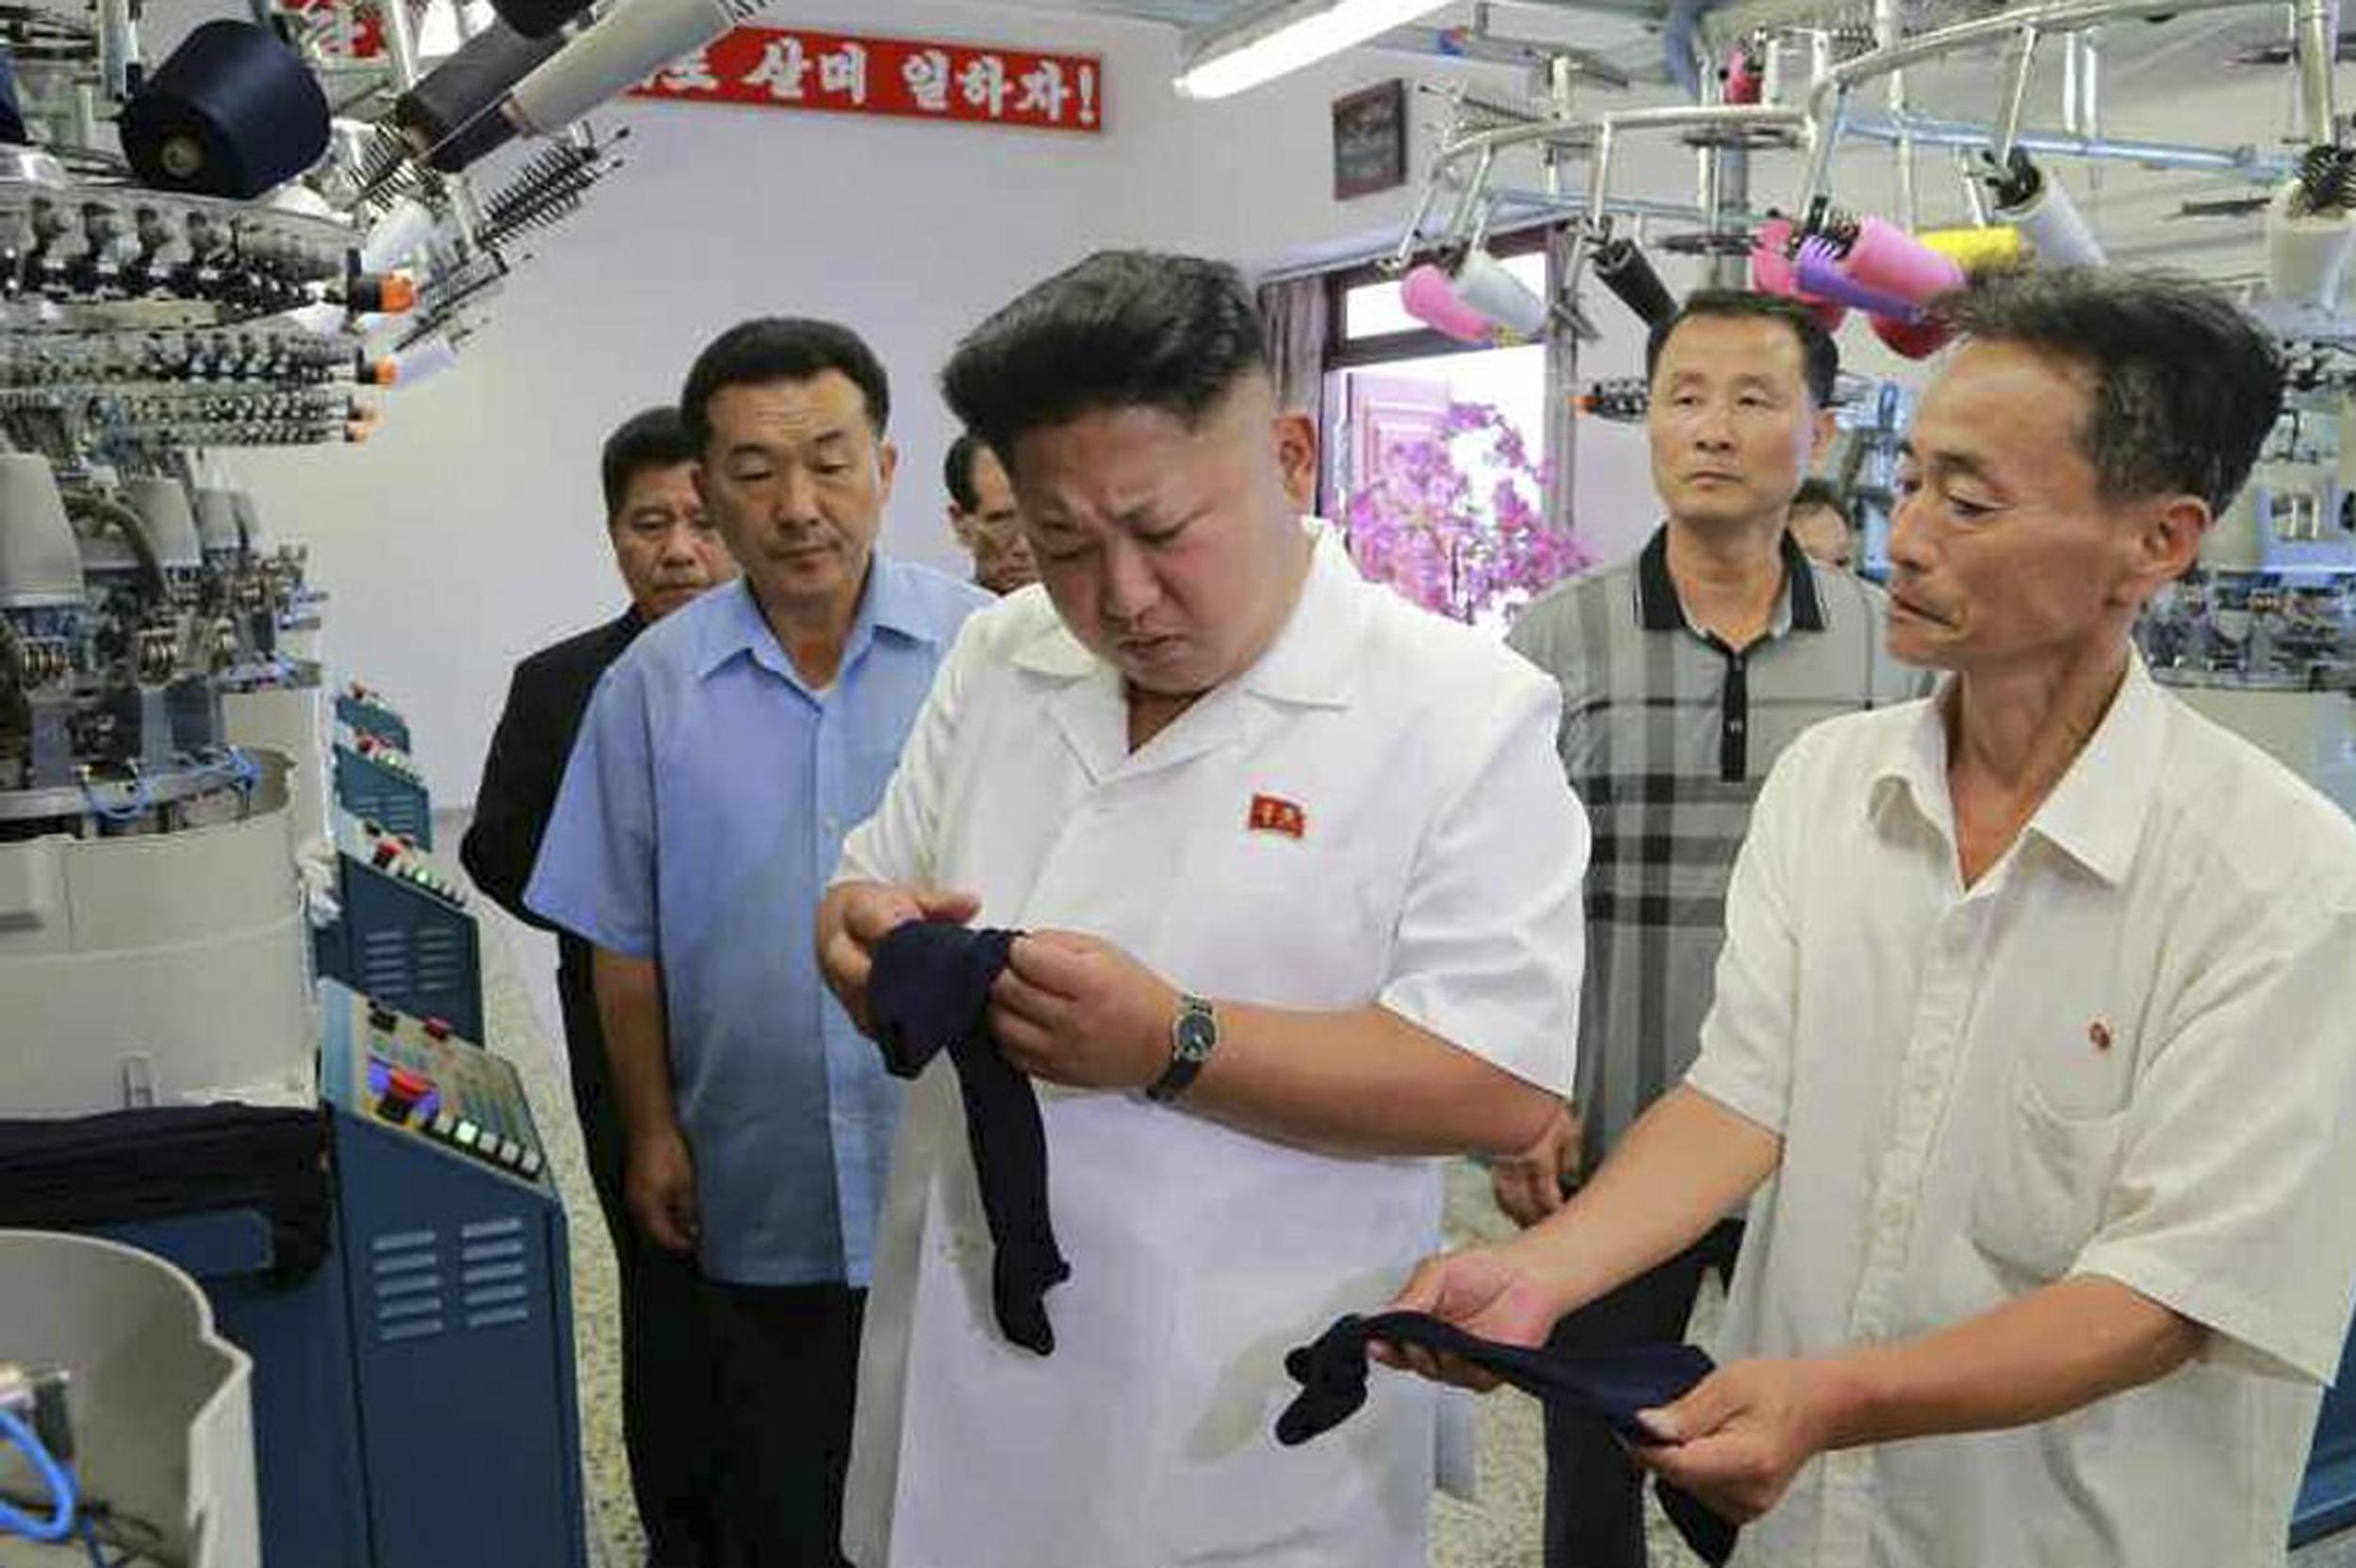 Right! North korea kim jong un women directly. This